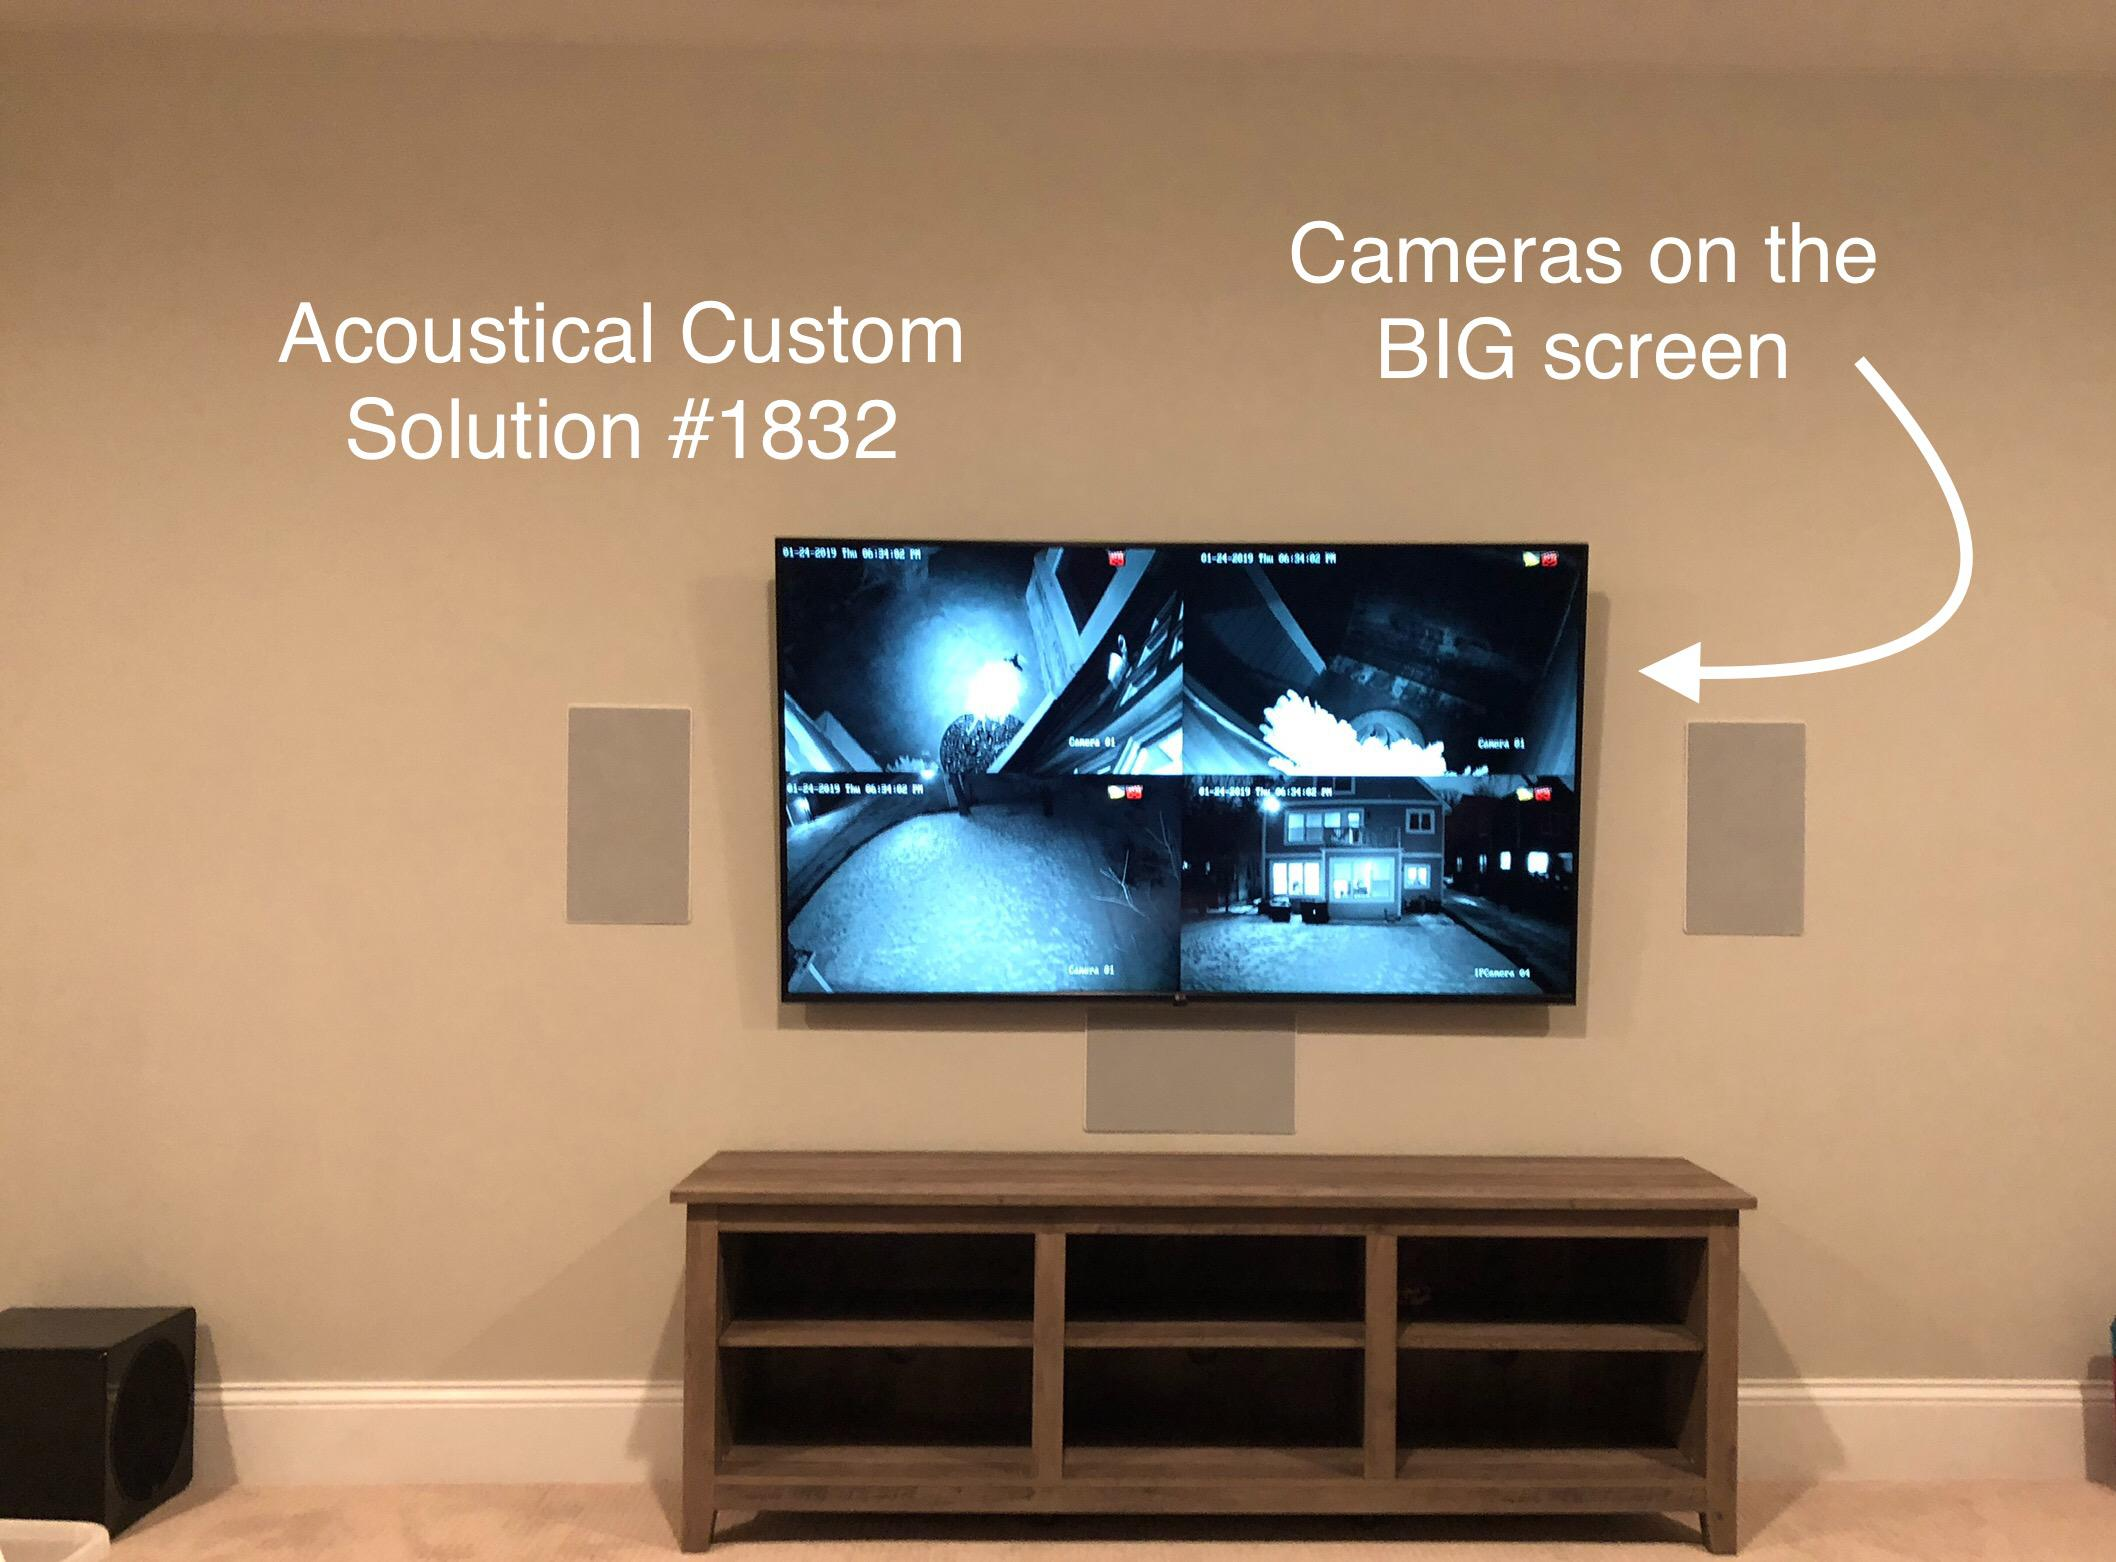 Acoustical Vision image 9